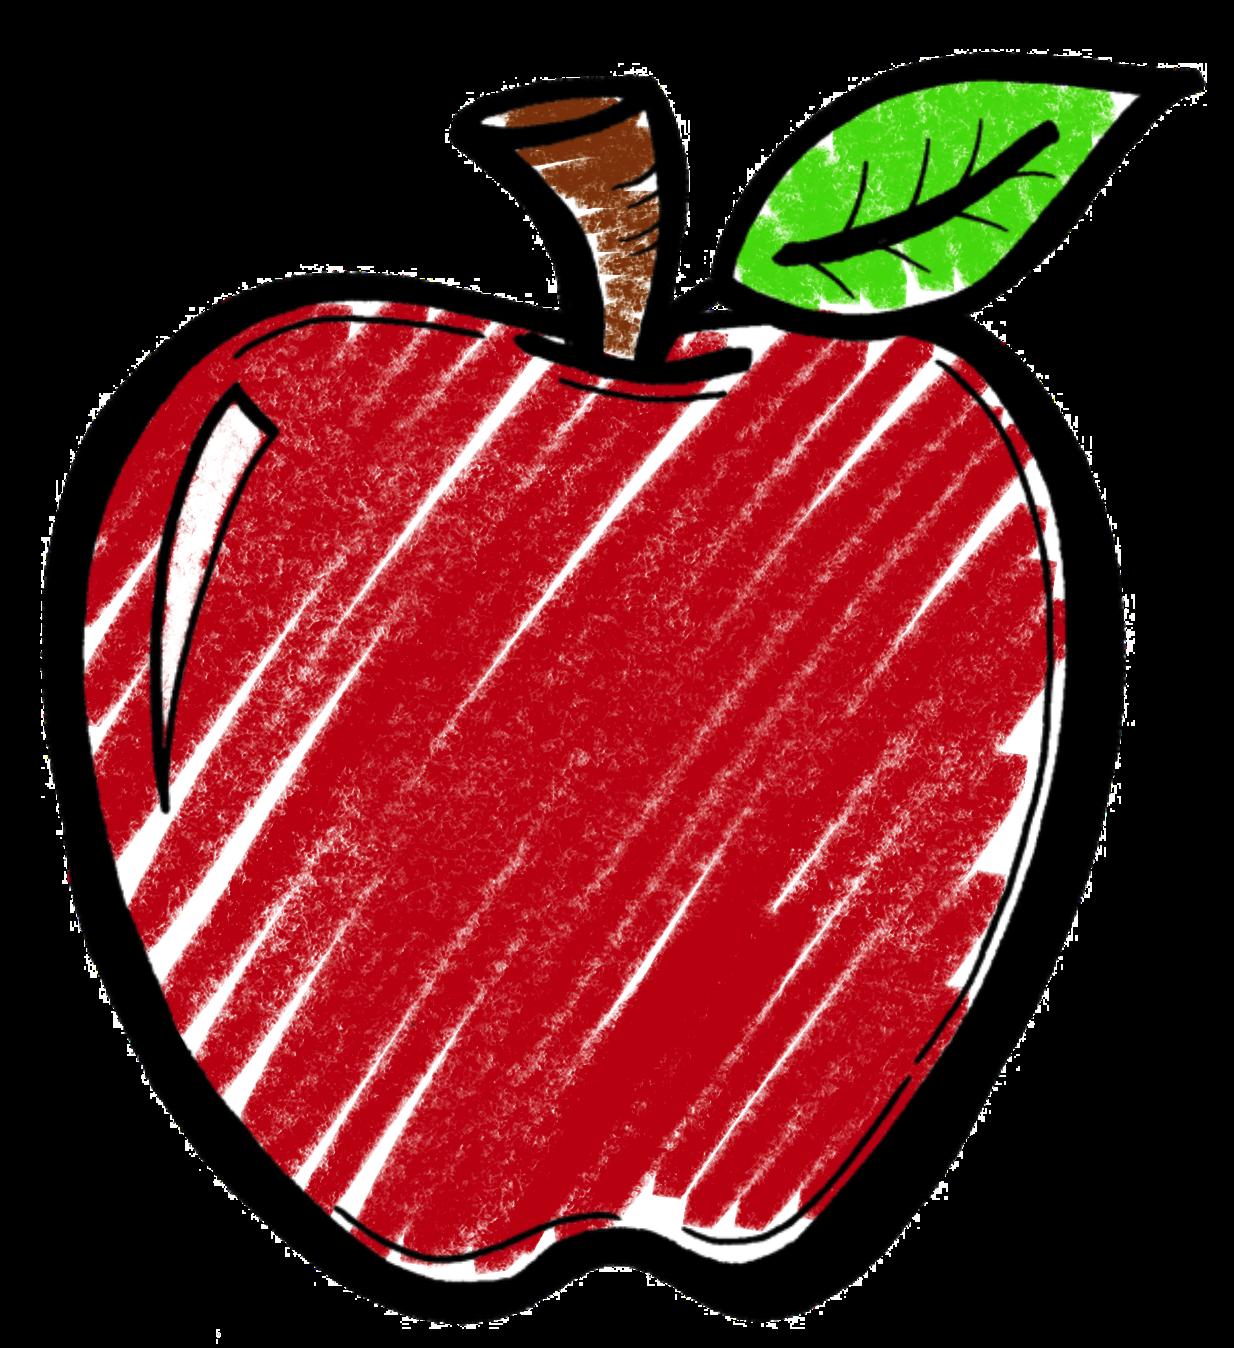 Apple clipart chalkboard image download Apple Clipart Chalkboard #2311359 image download